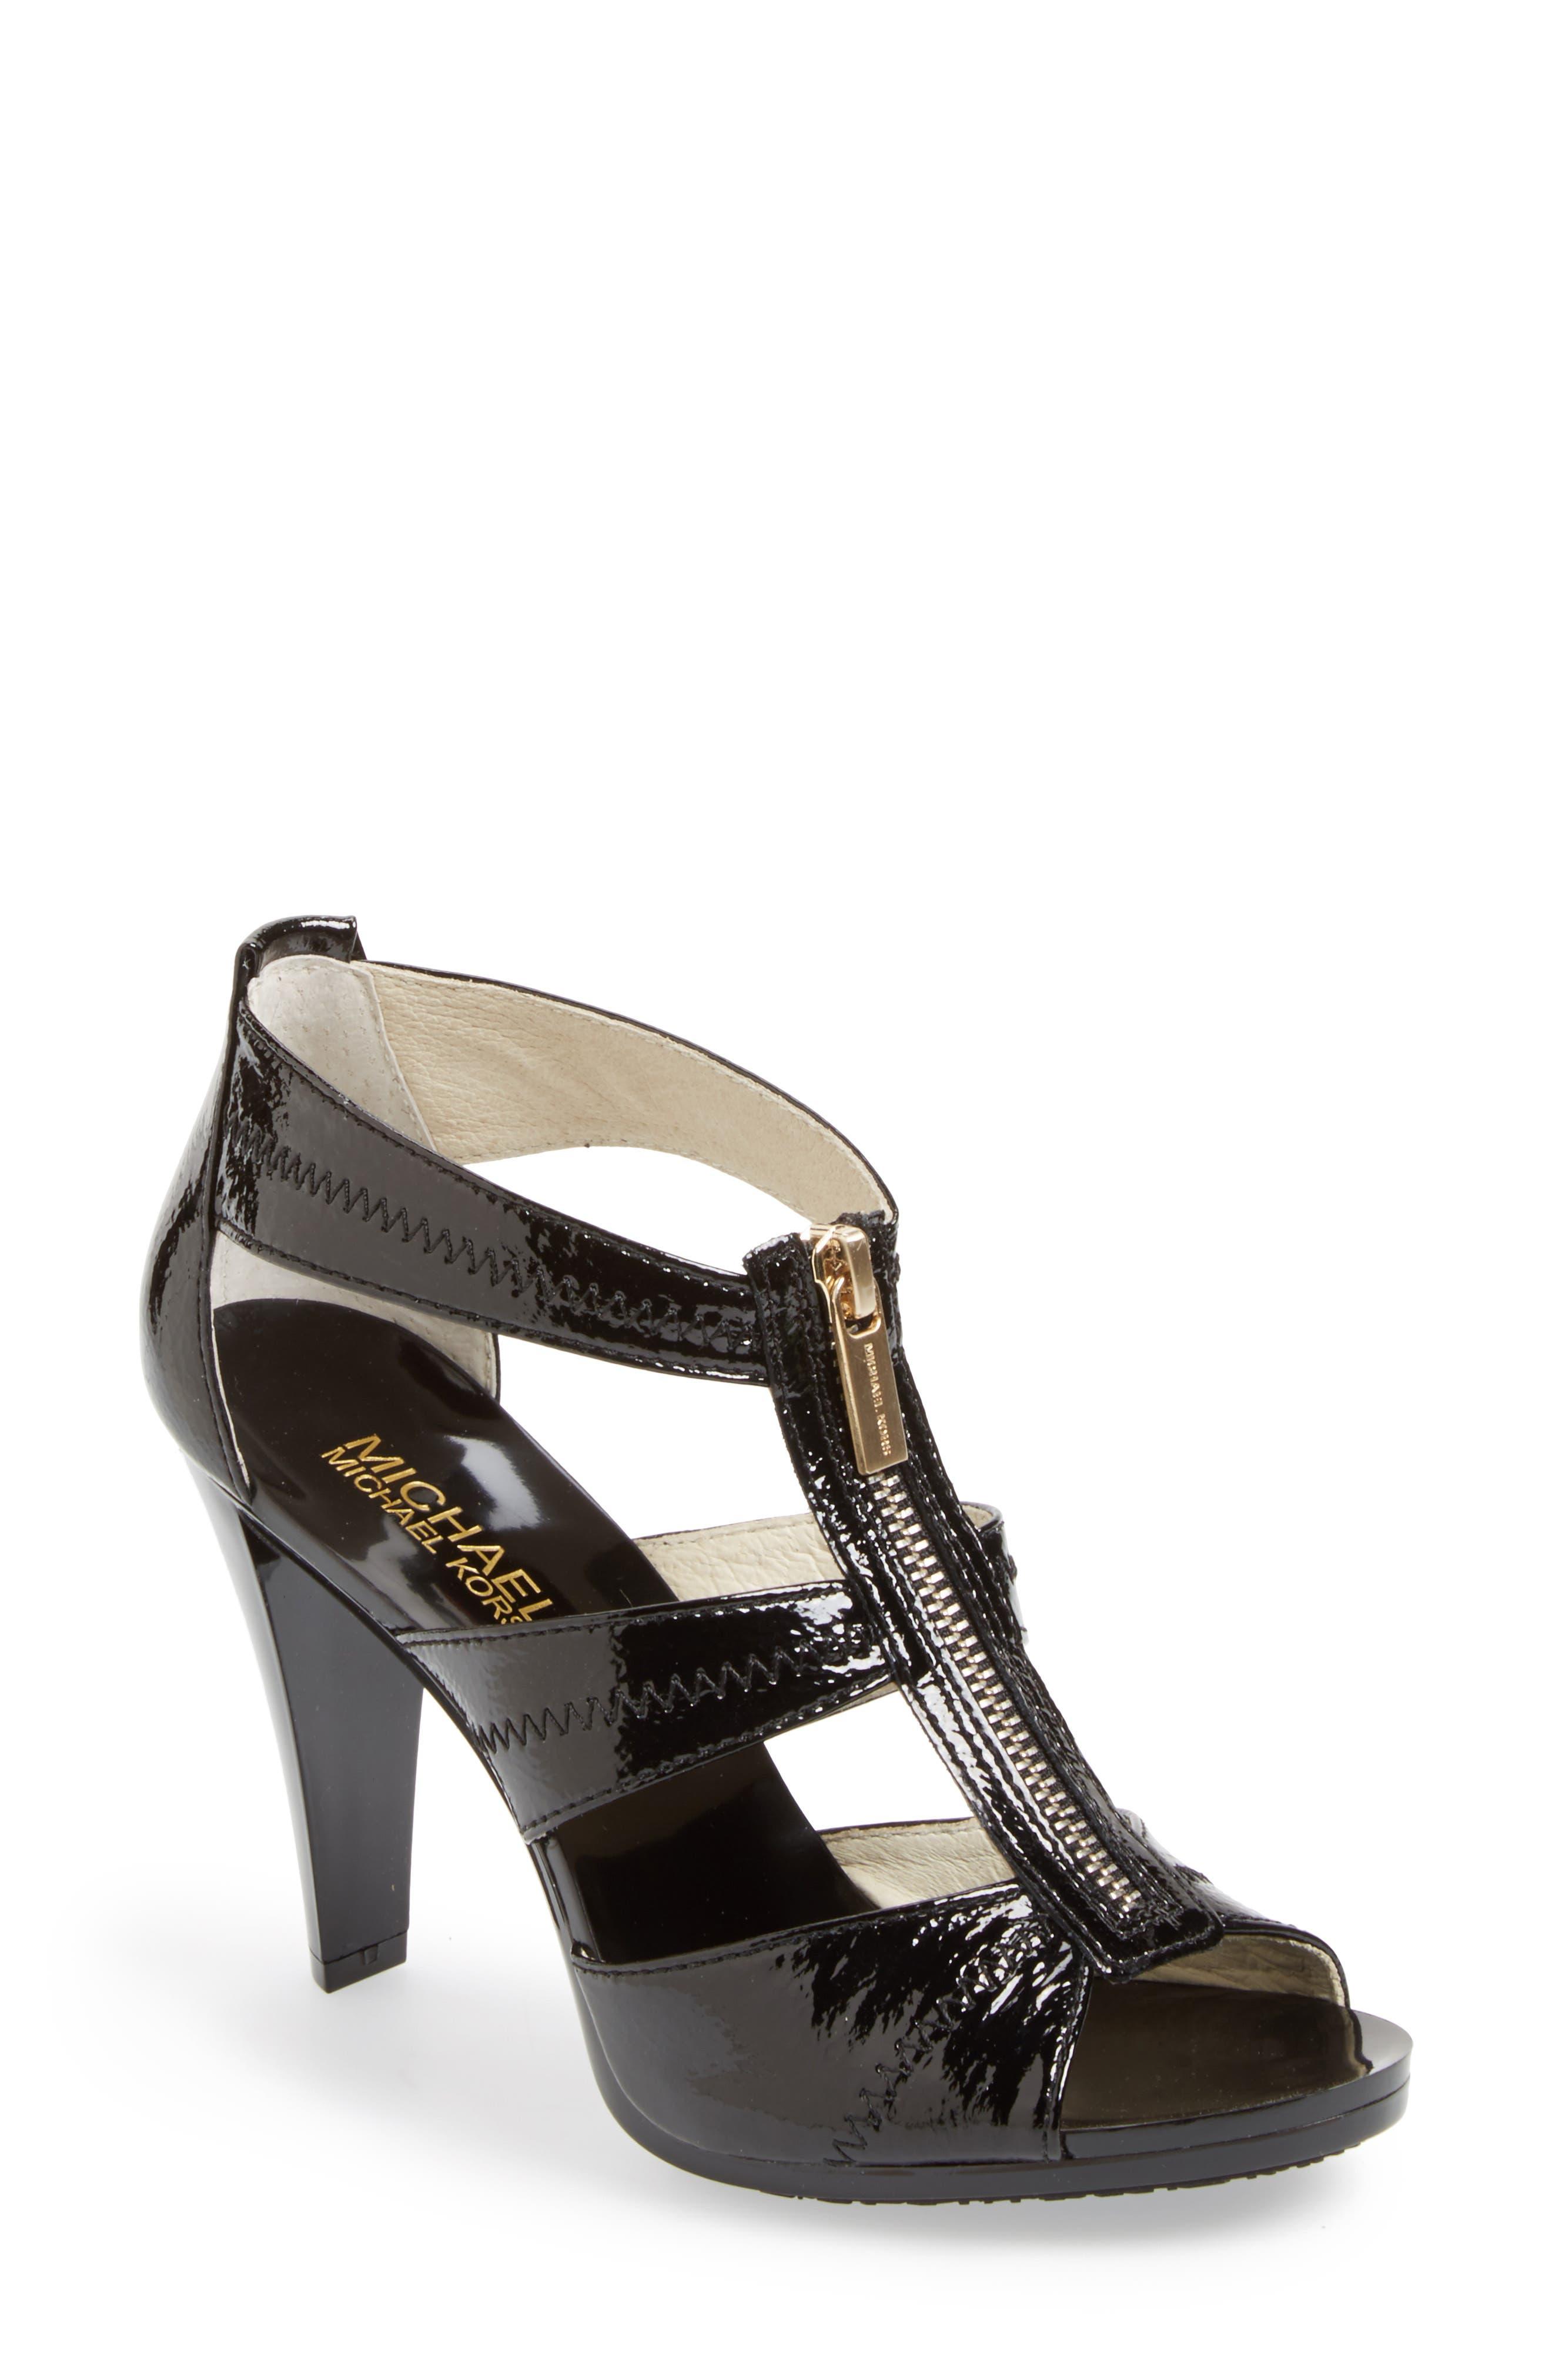 Alternate Image 1 Selected - MICHAEL Michael Kors 'Berkley' T-Strap Sandal (Women)